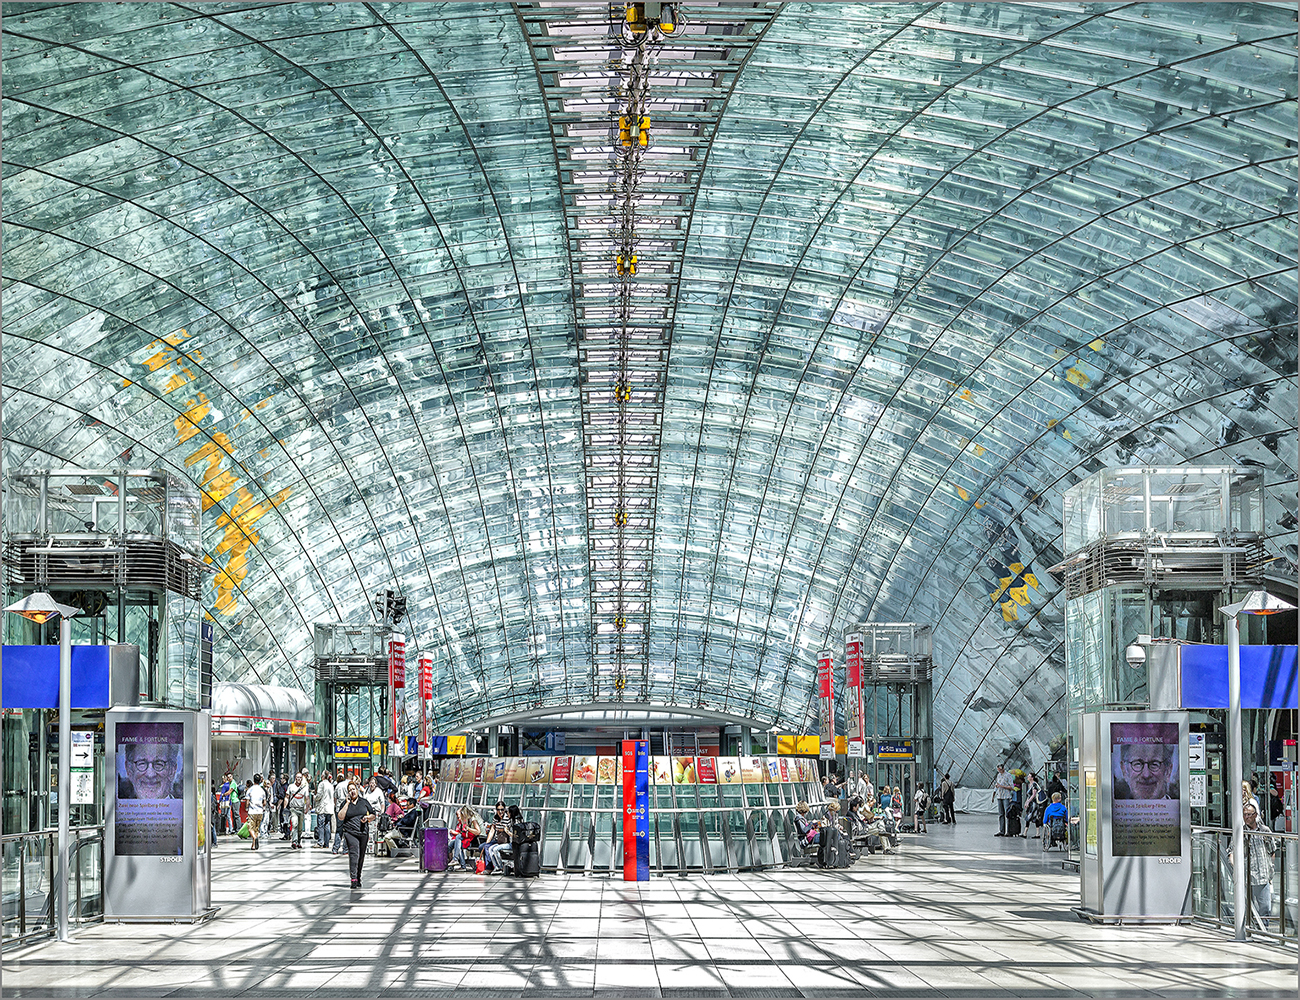 Frankfurt Airport / Railway Station, Germany